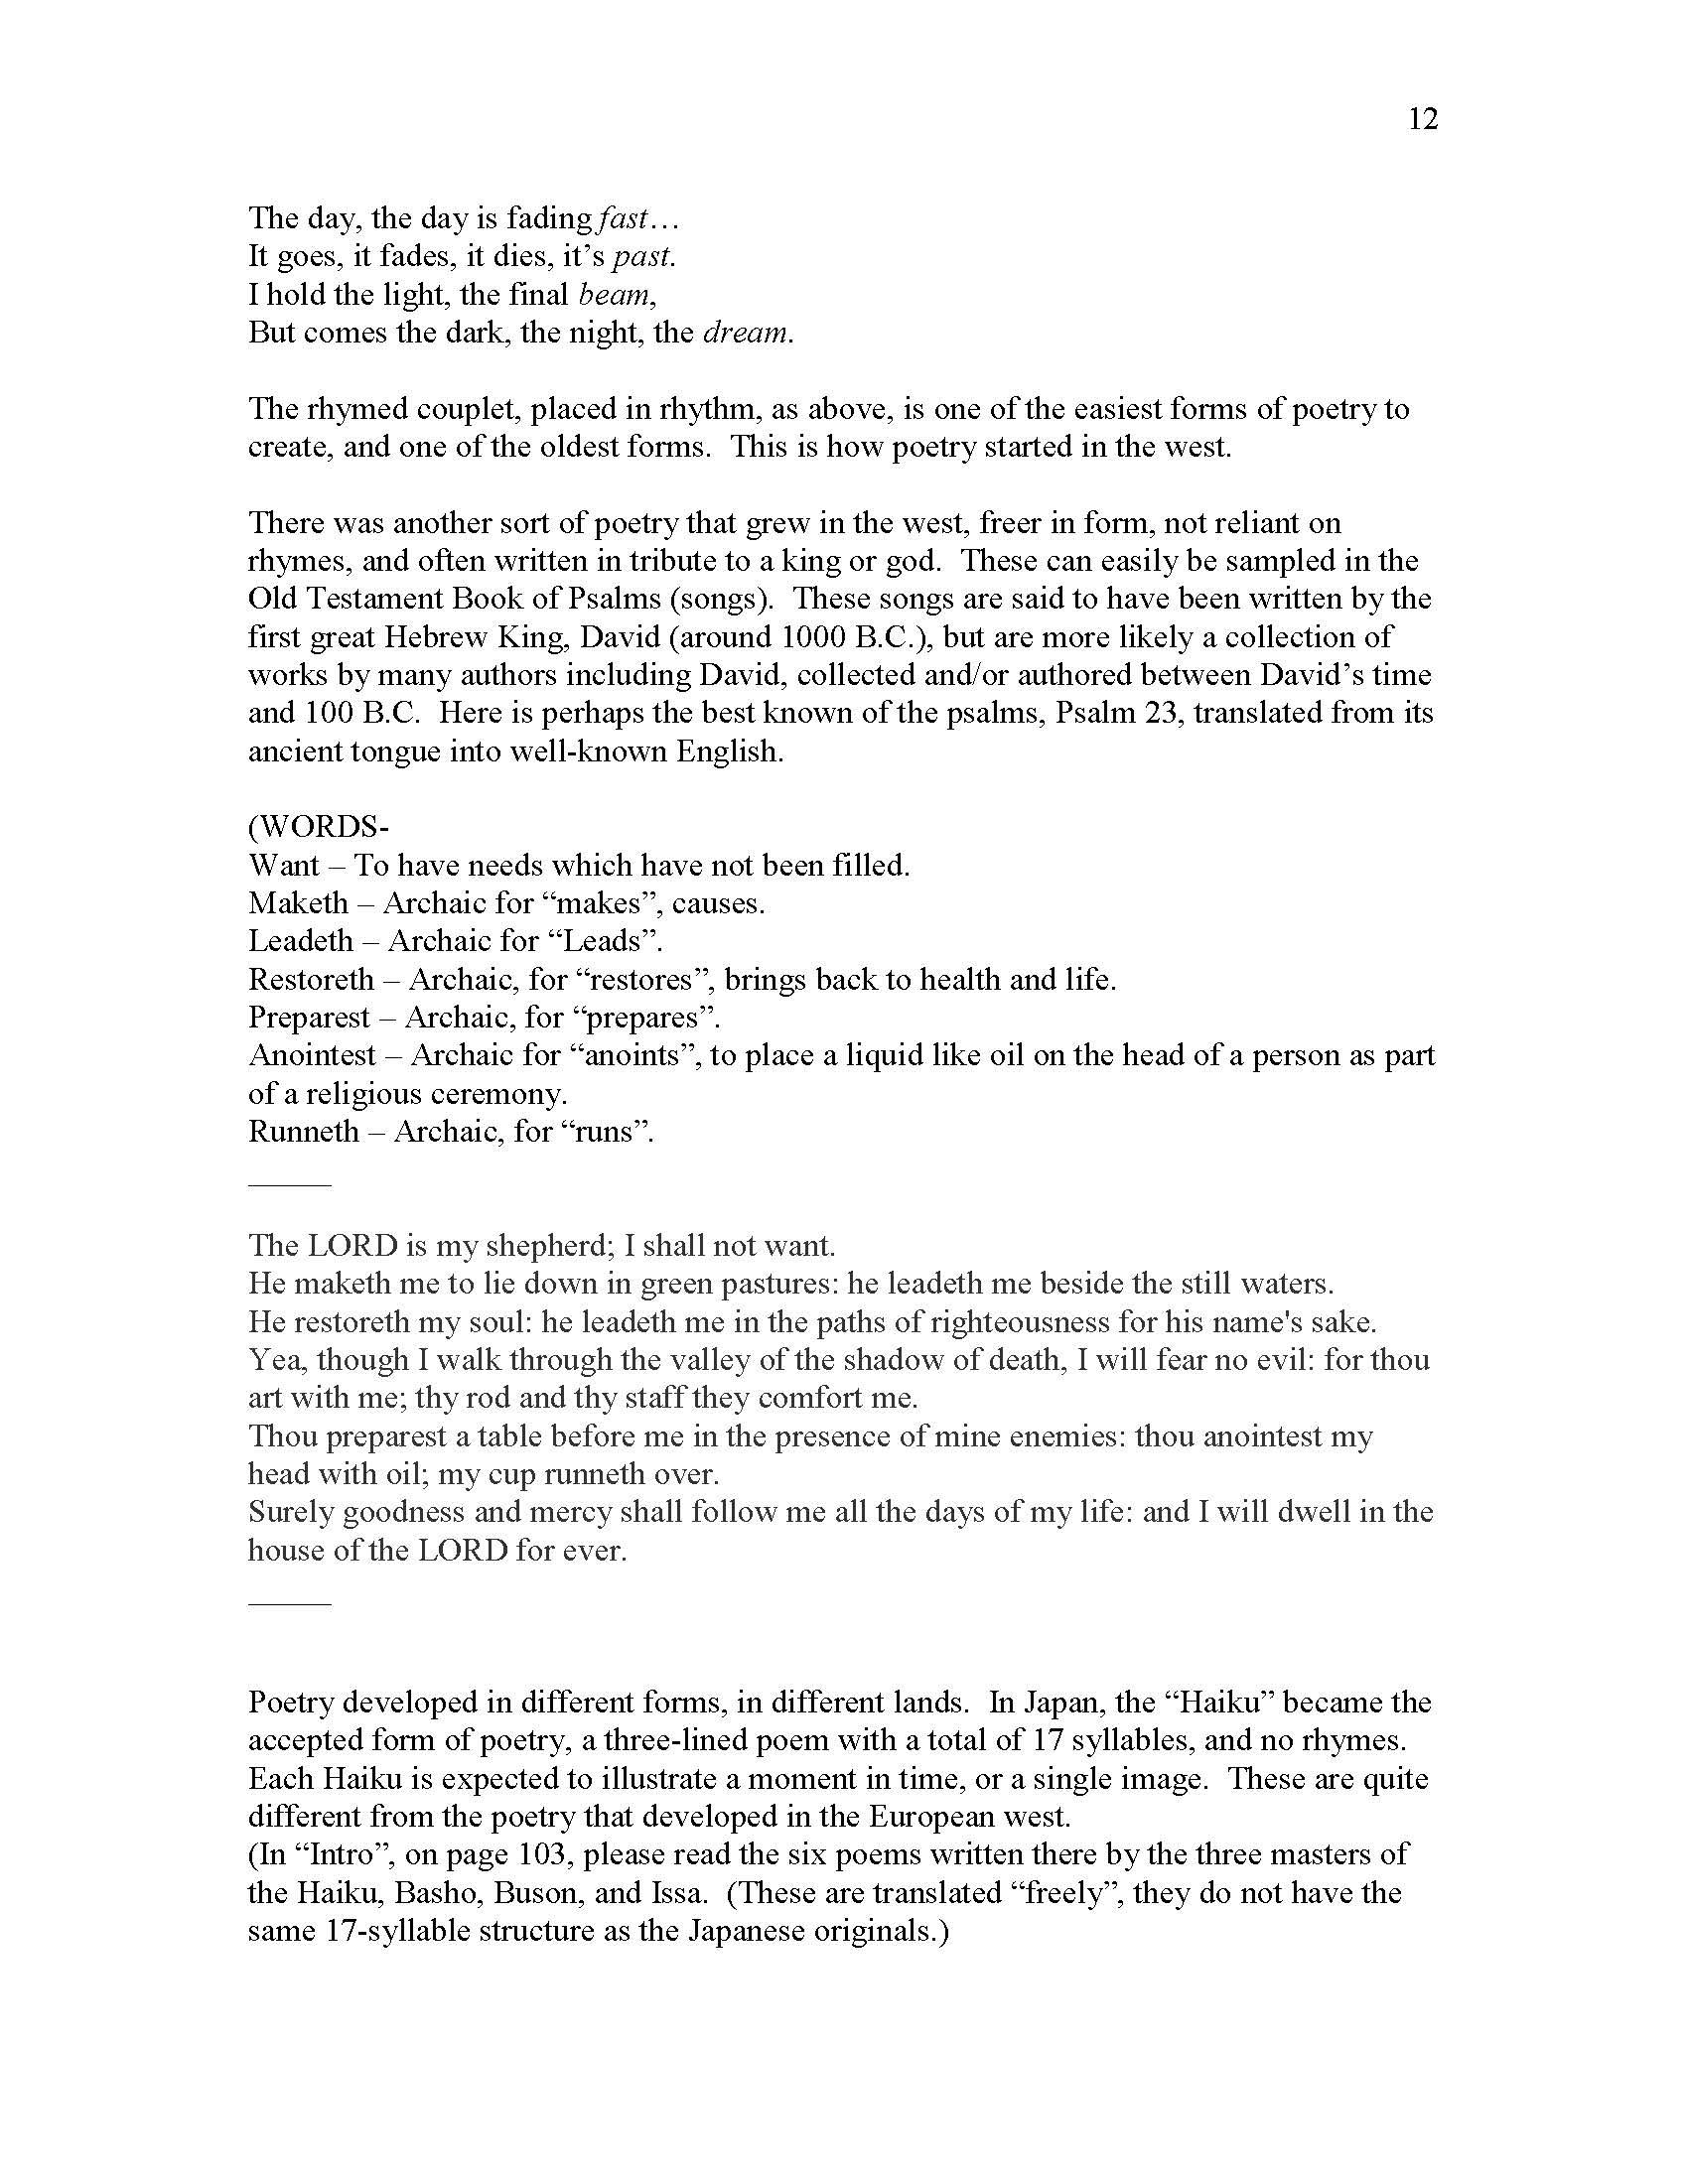 Step 4+ Master's Creative Writing Poetry & Lyrics_Page_013.jpg